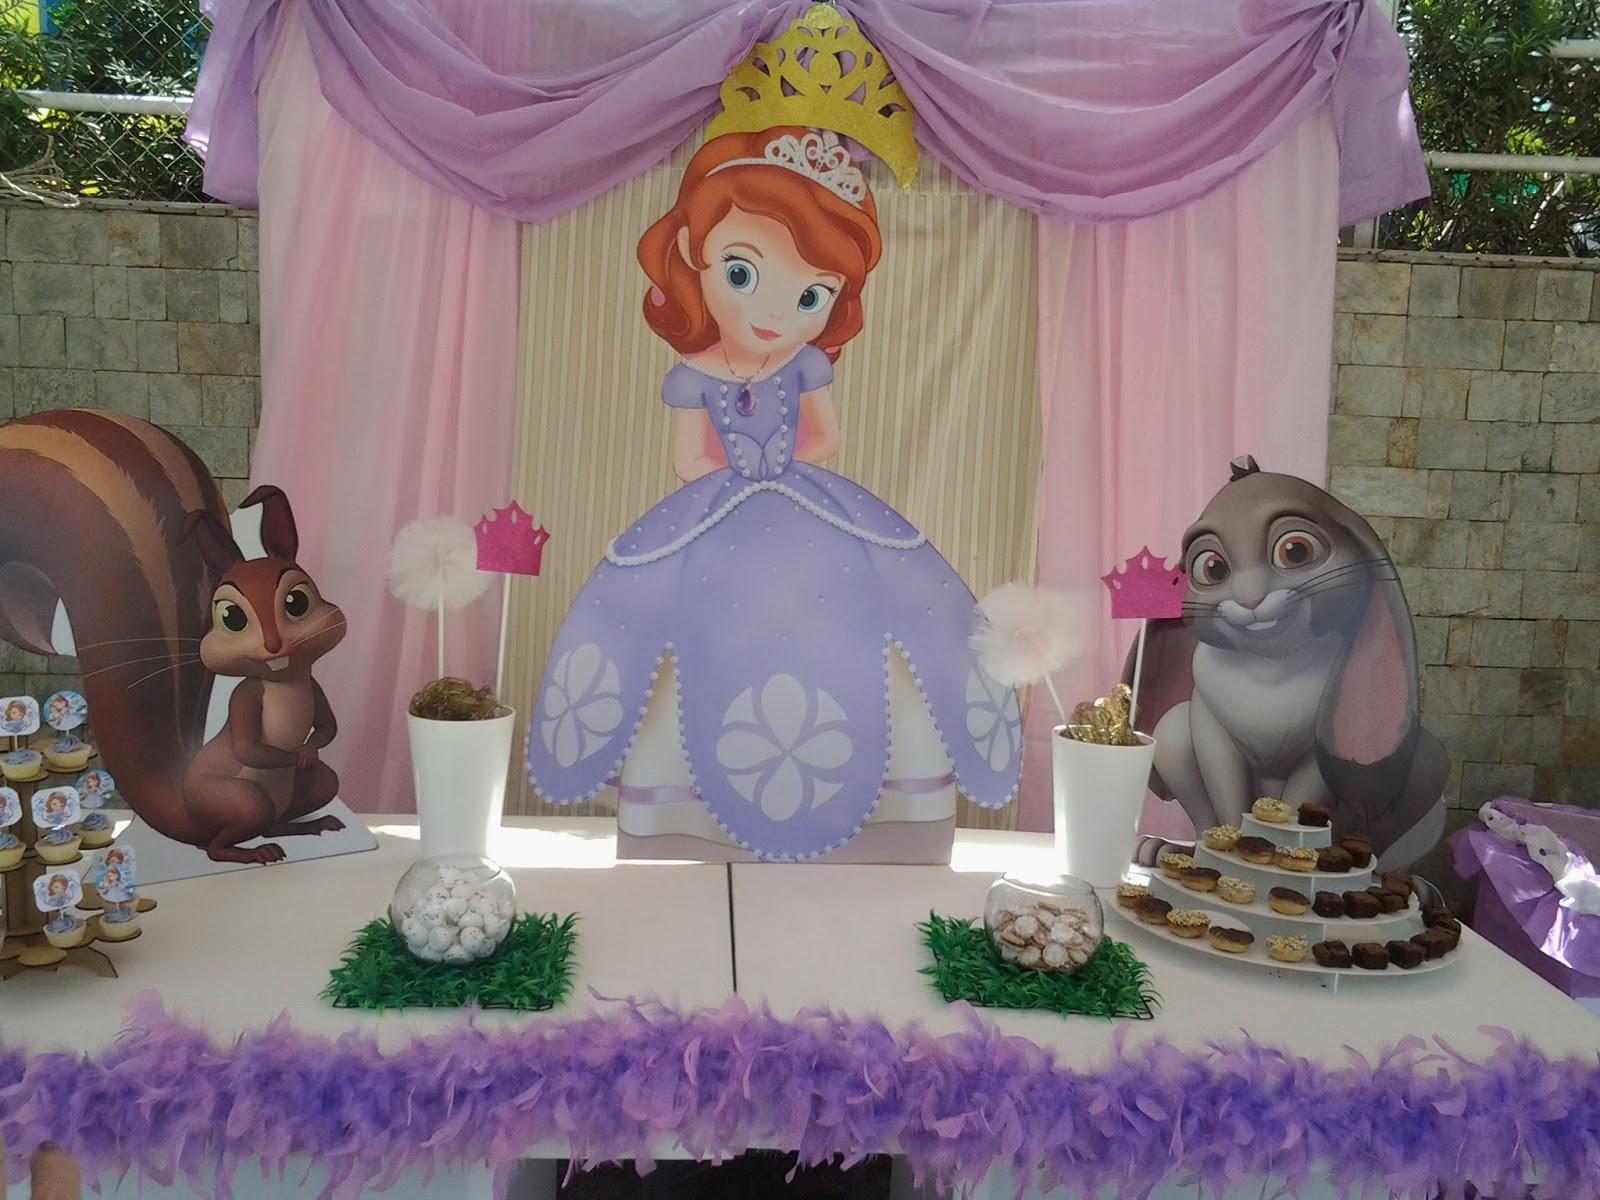 Pkelandia fiesta tem tica de la princesa sof a - Fiestas de cumpleanos de princesas ...